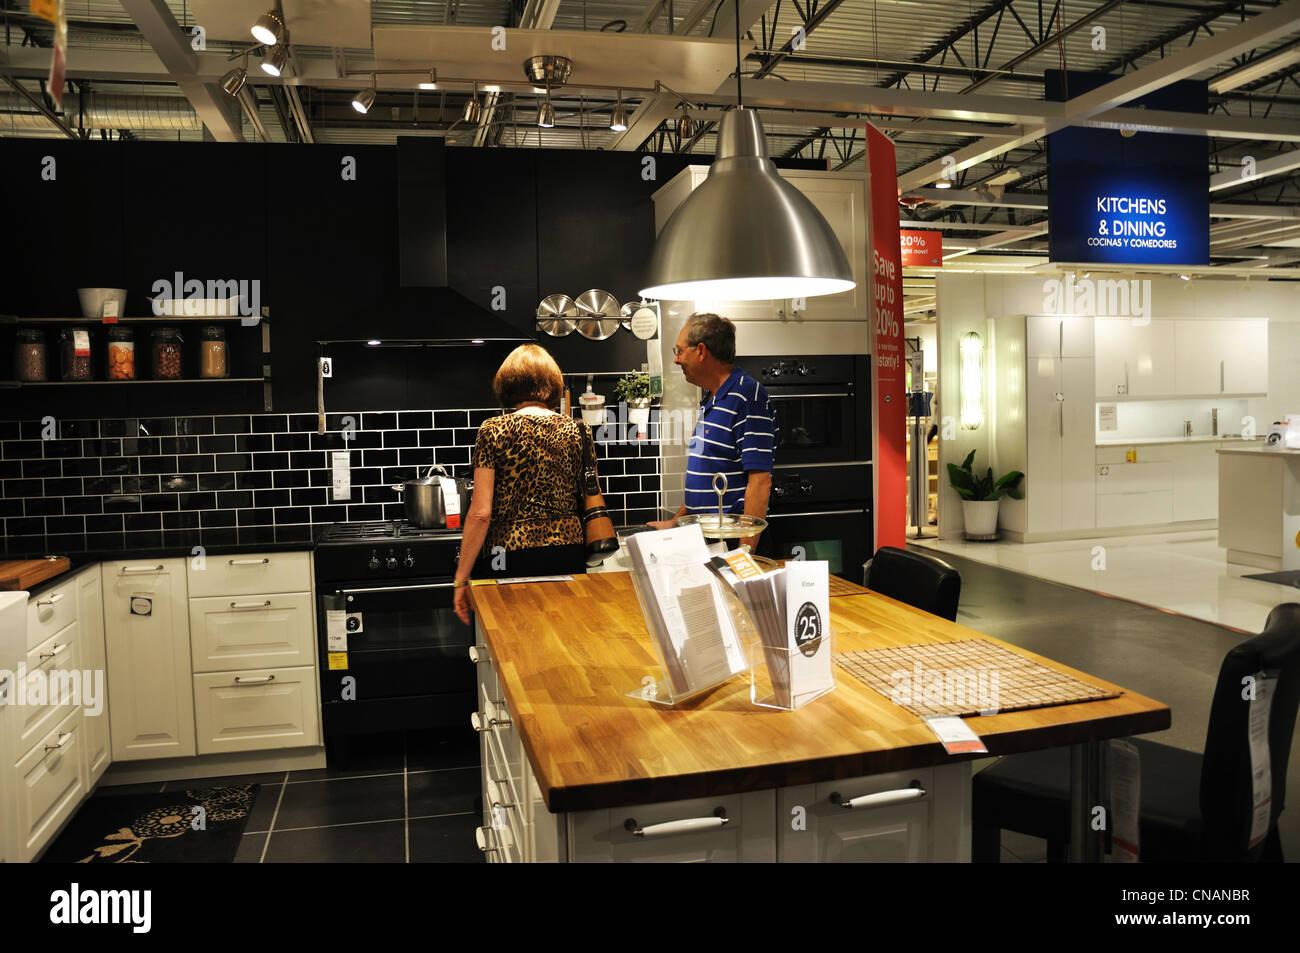 Ikea Küche Stockfotos & Ikea Küche Bilder - Alamy